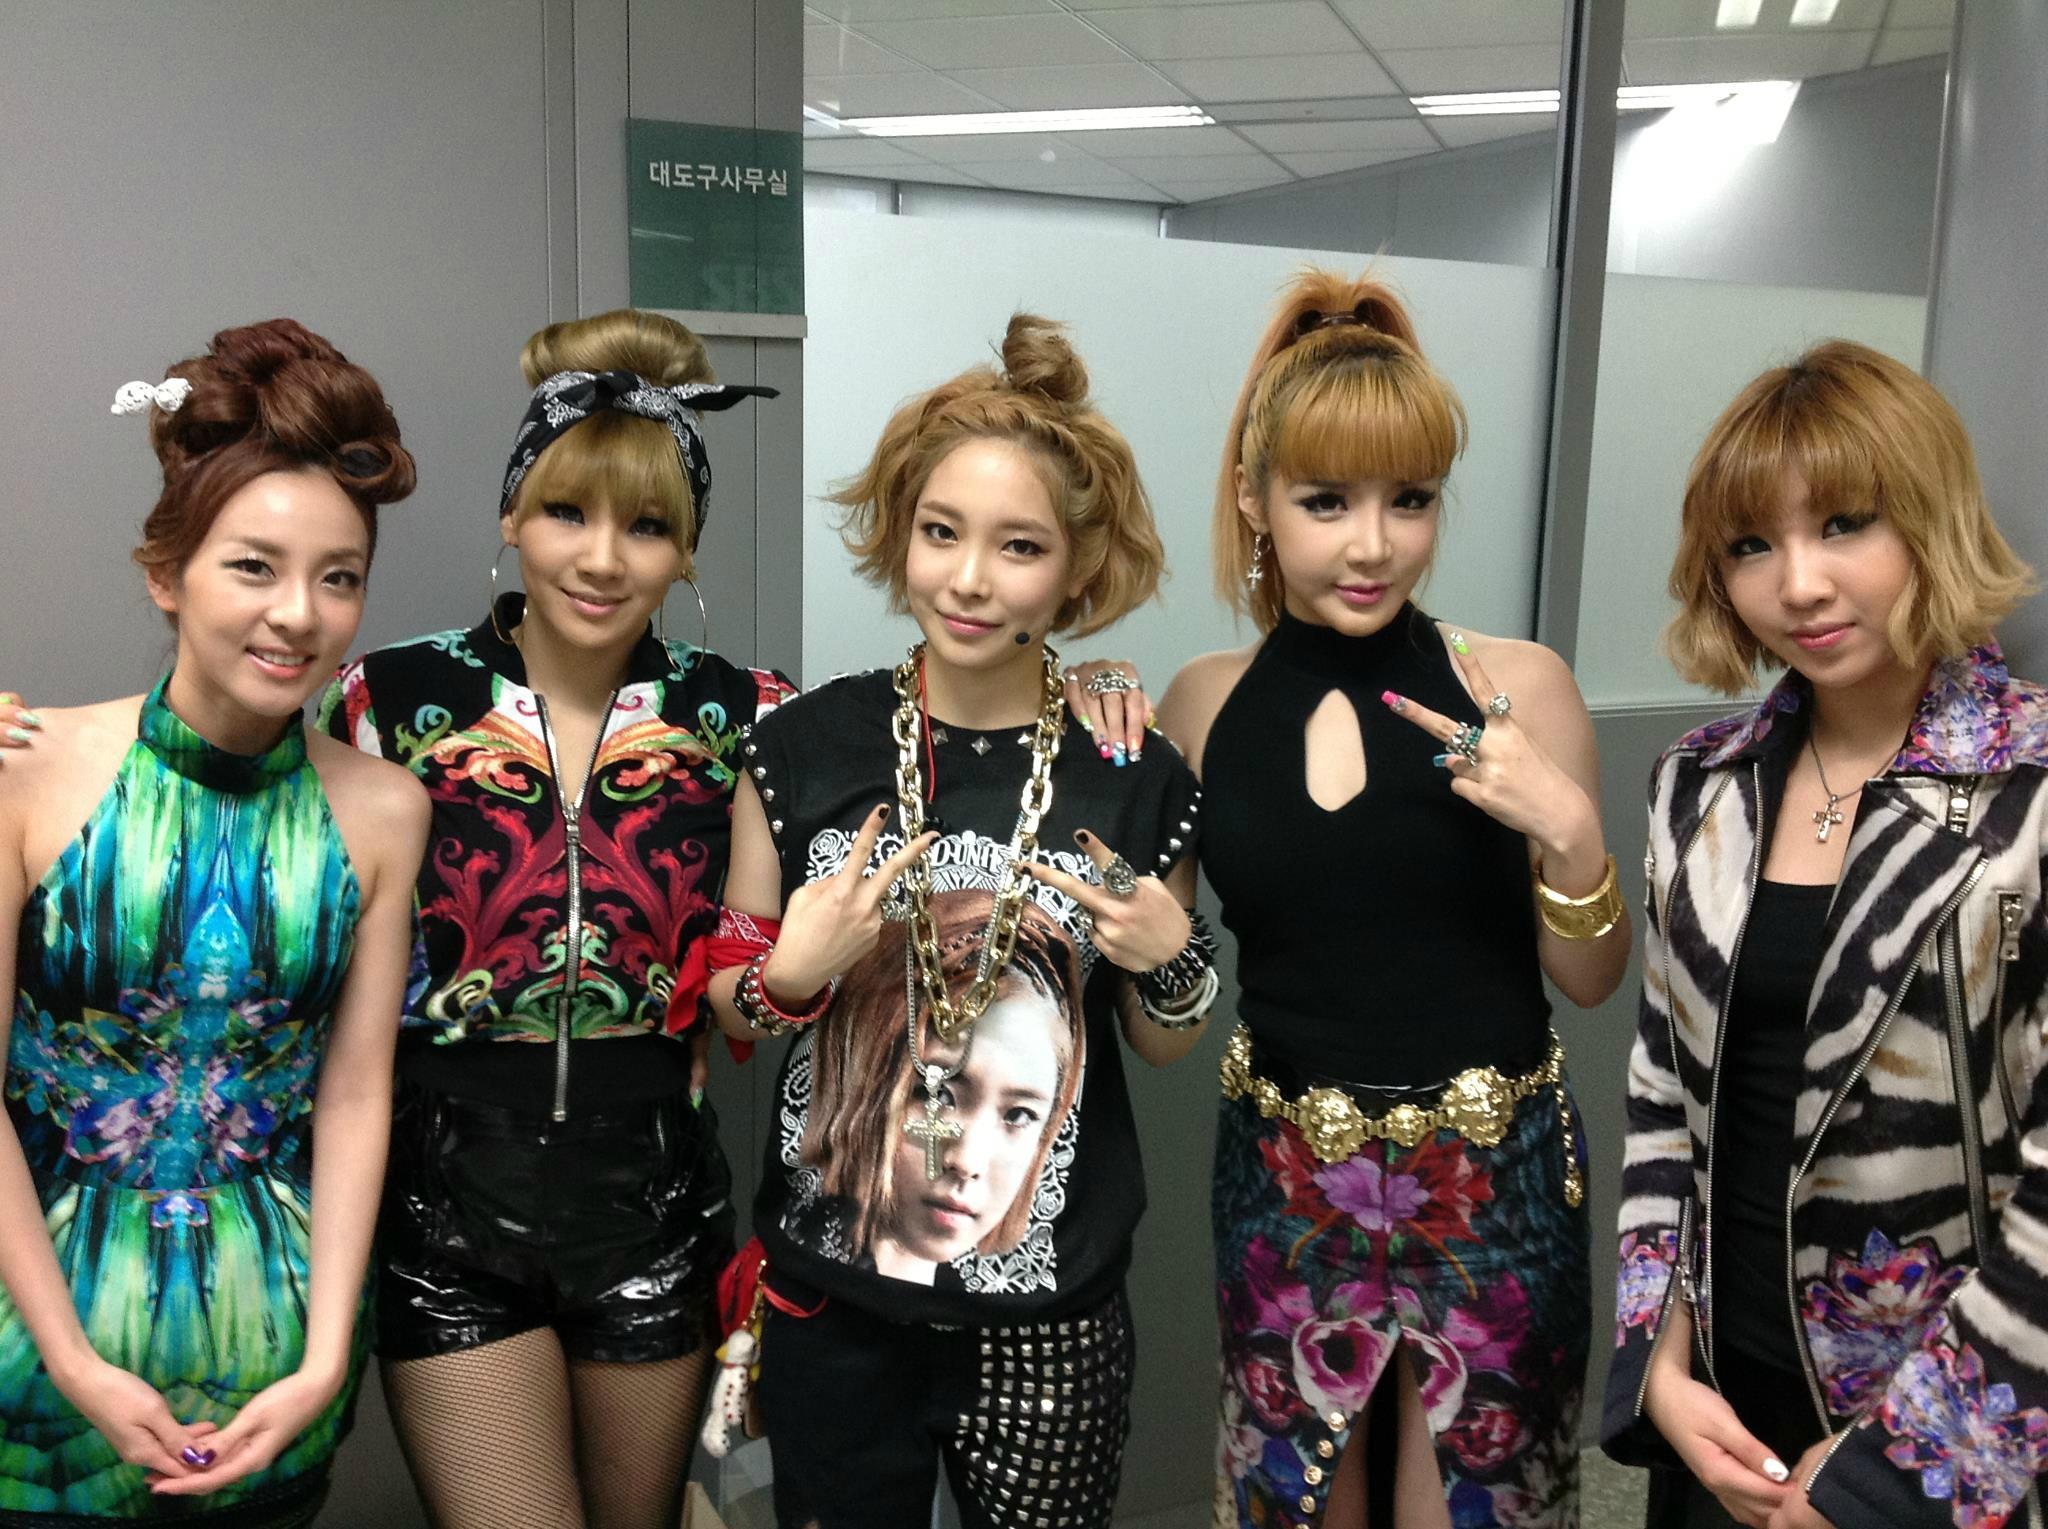 2ne1-with-ex-YG-trainee-Ujin-of-D-Unit-SBS-Inkigayo-Backstage-2ne1-32230401-2048-1529